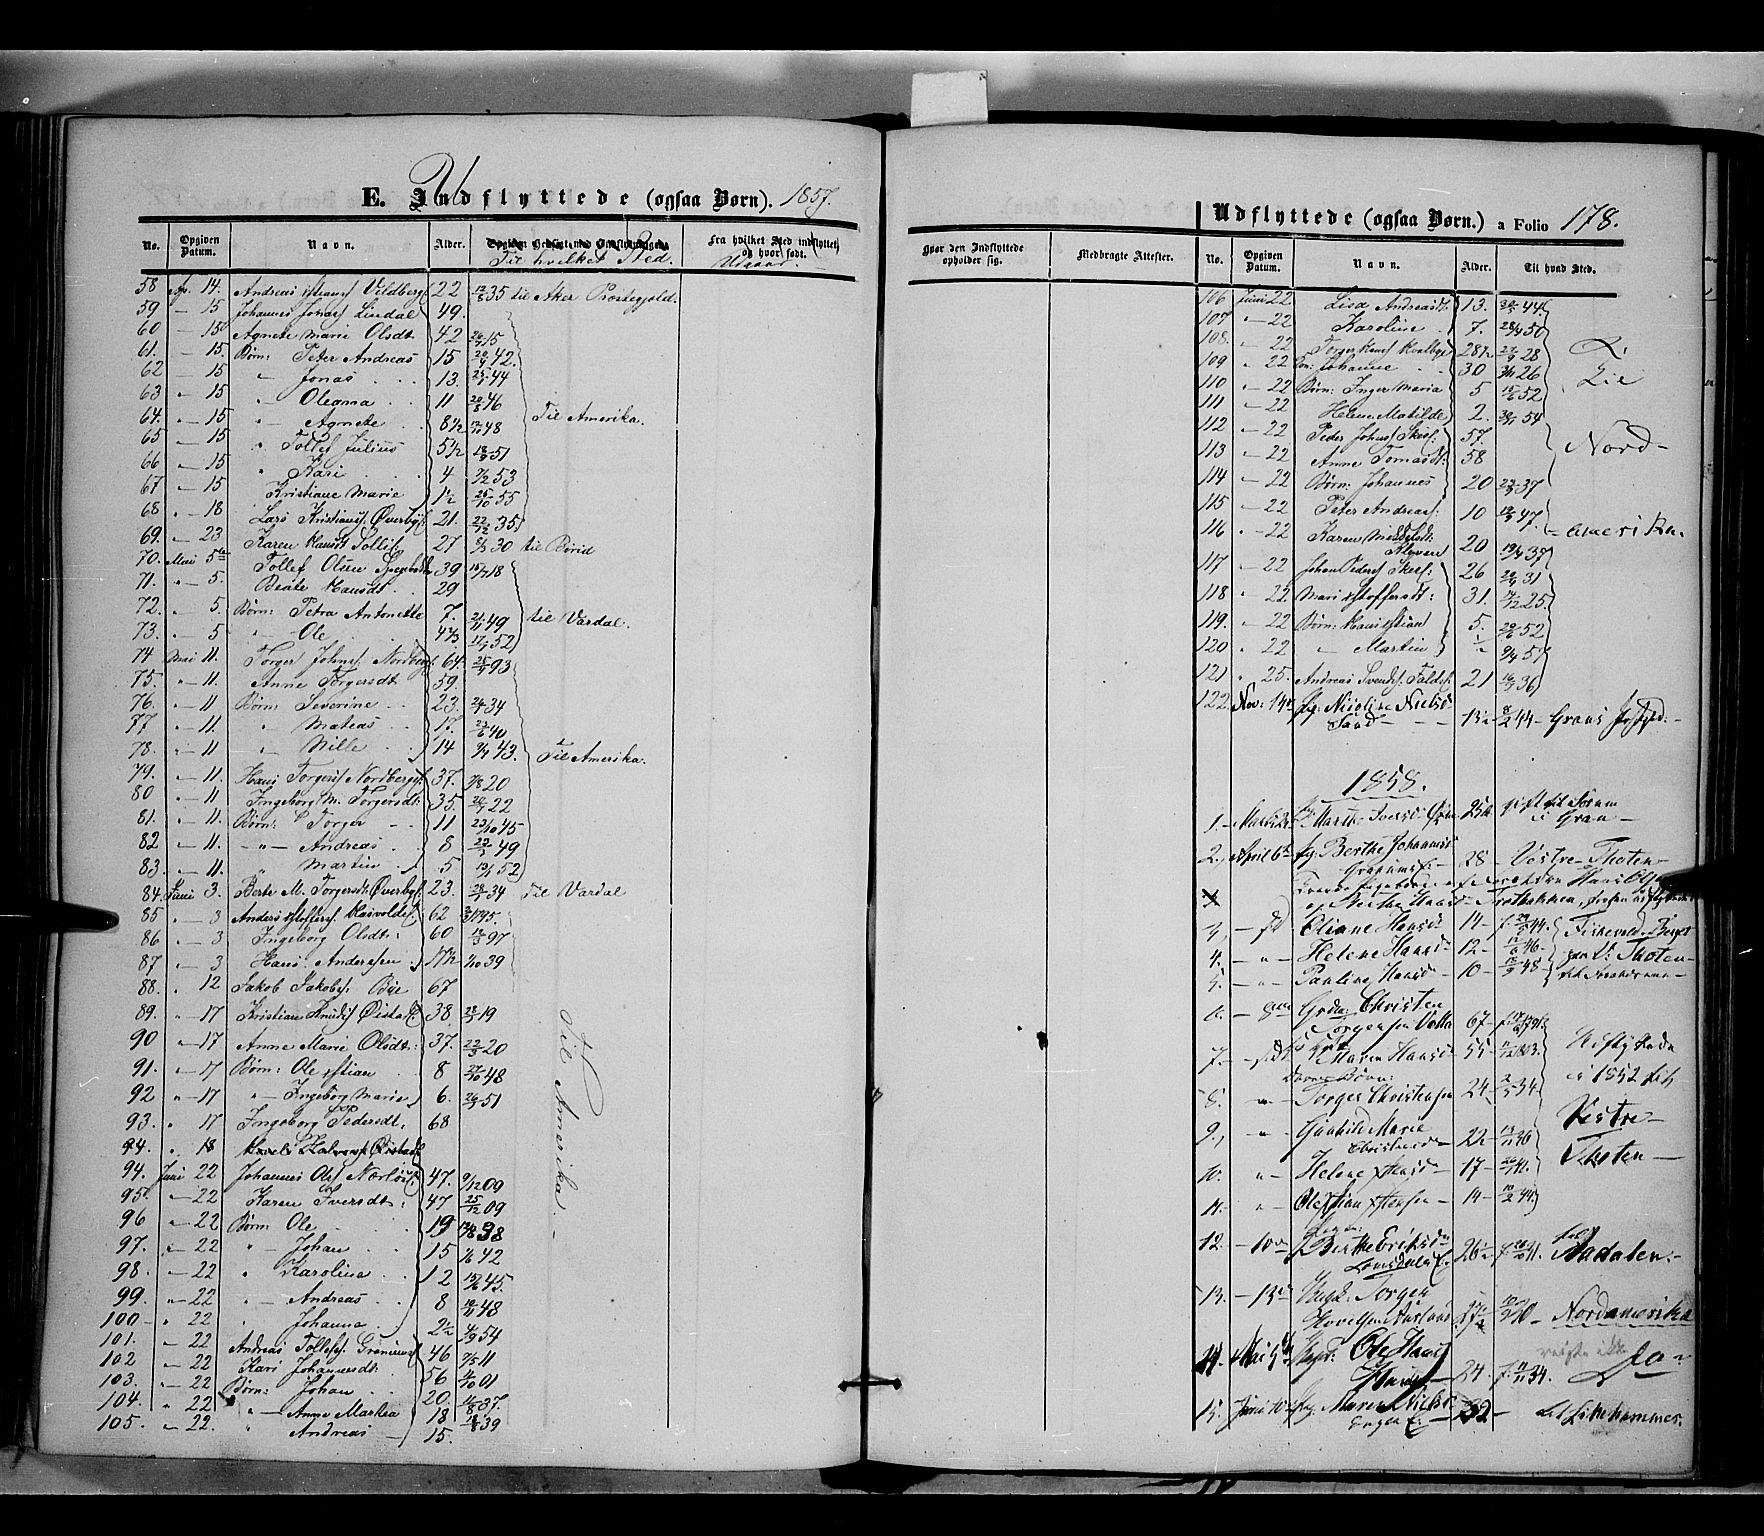 SAH, Land prestekontor, Ministerialbok nr. 9, 1847-1859, s. 178